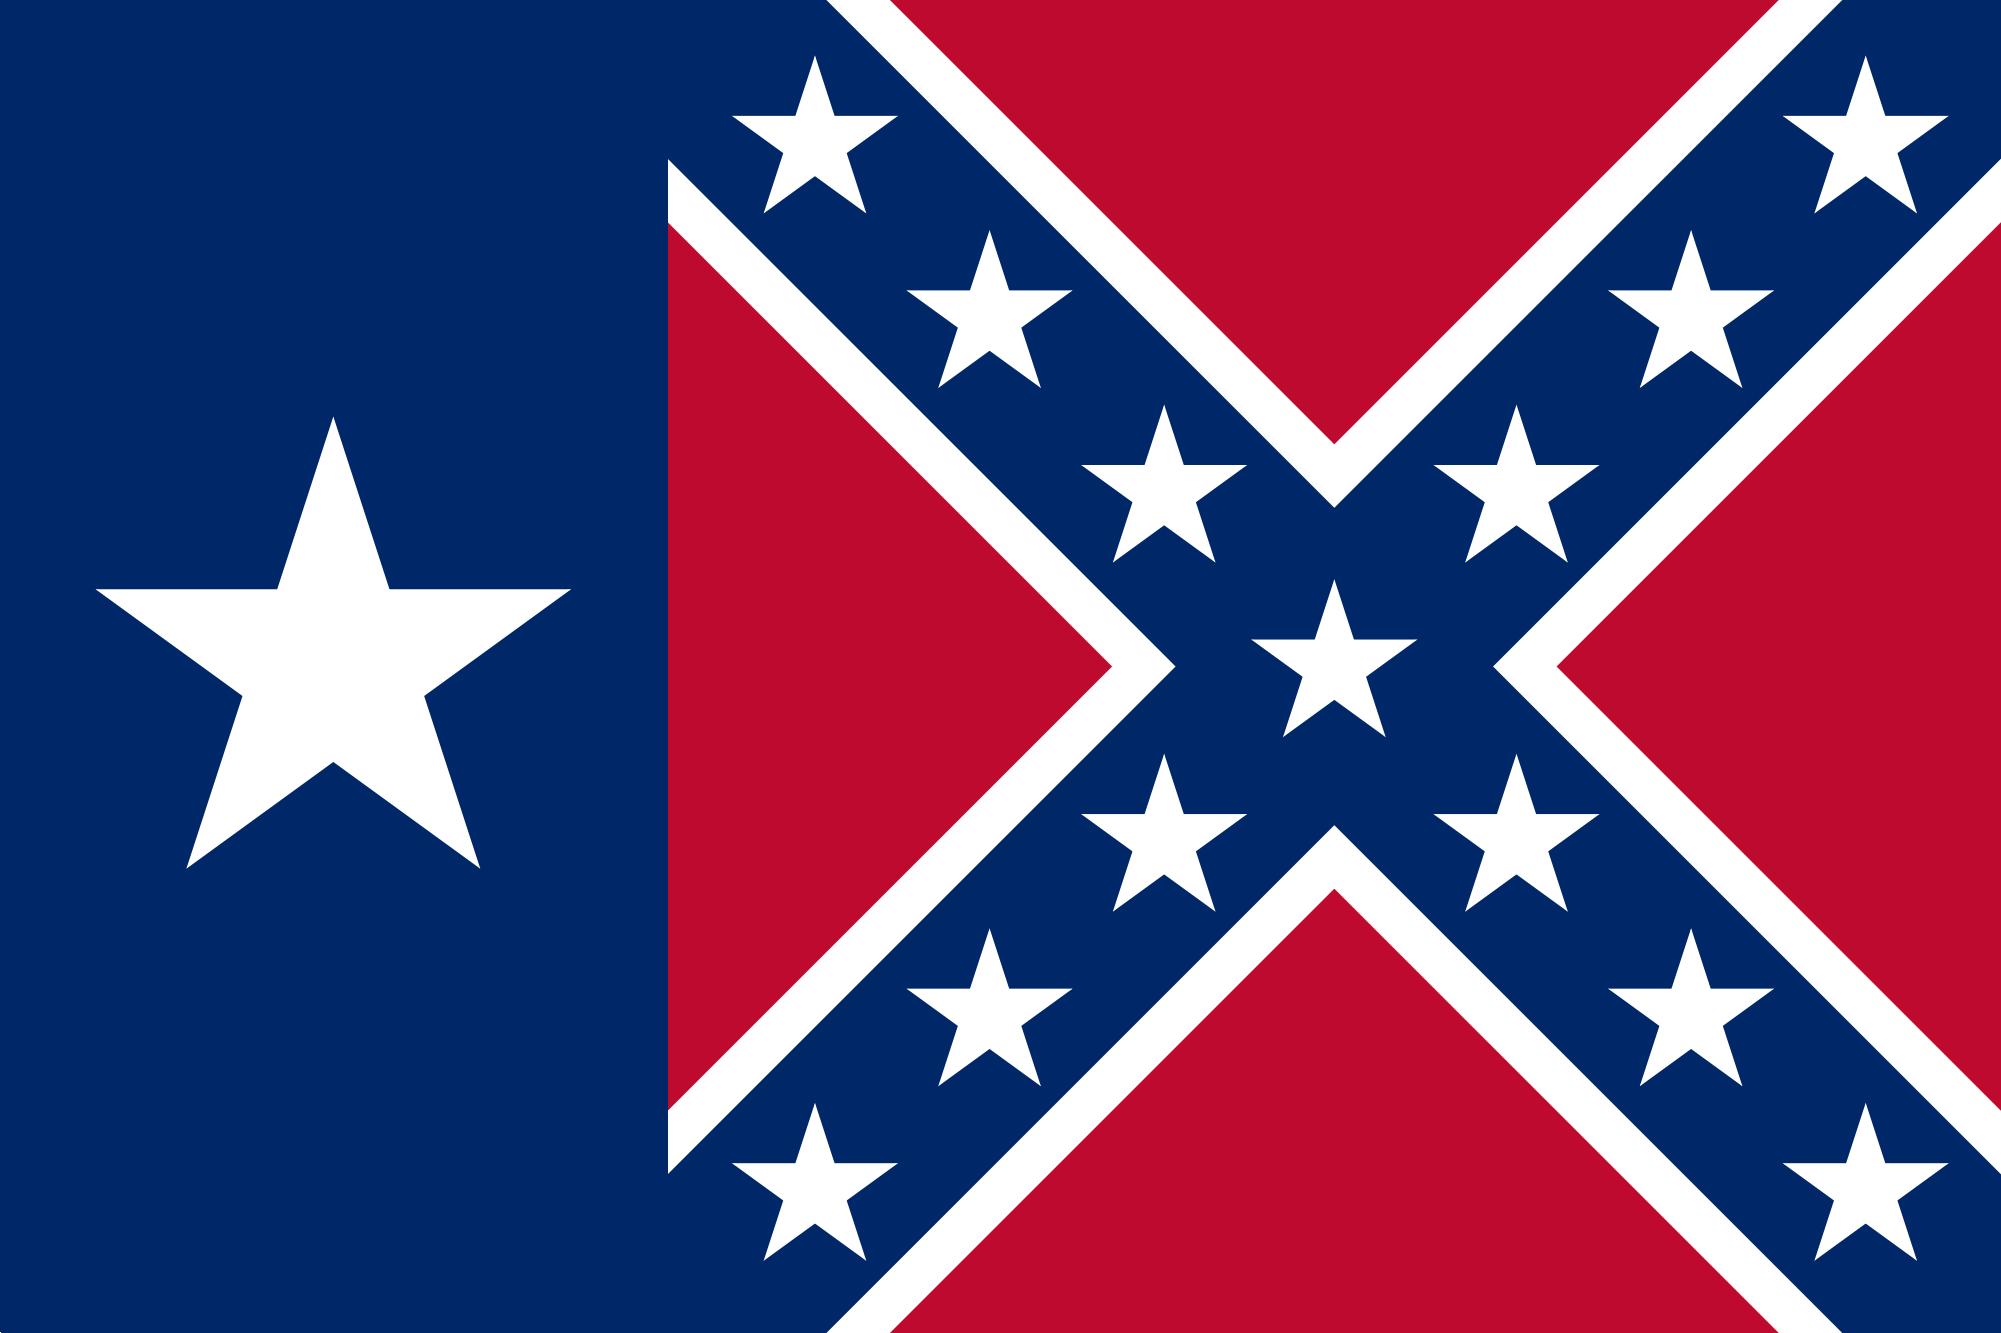 File:Texas Rebel Flag.png.